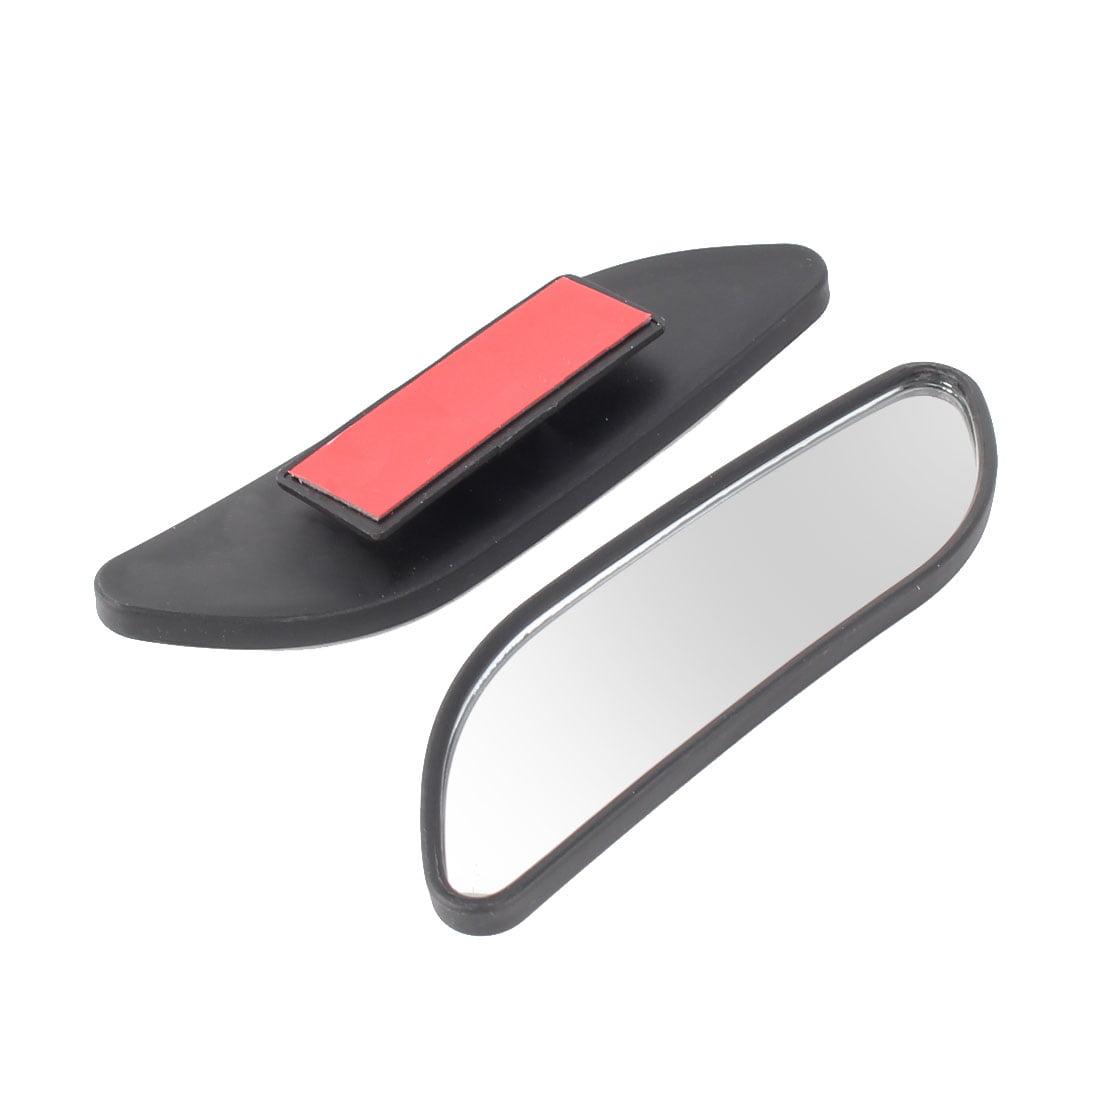 Car Auto Parallelogram Convex Rear View Blind Spot Wide